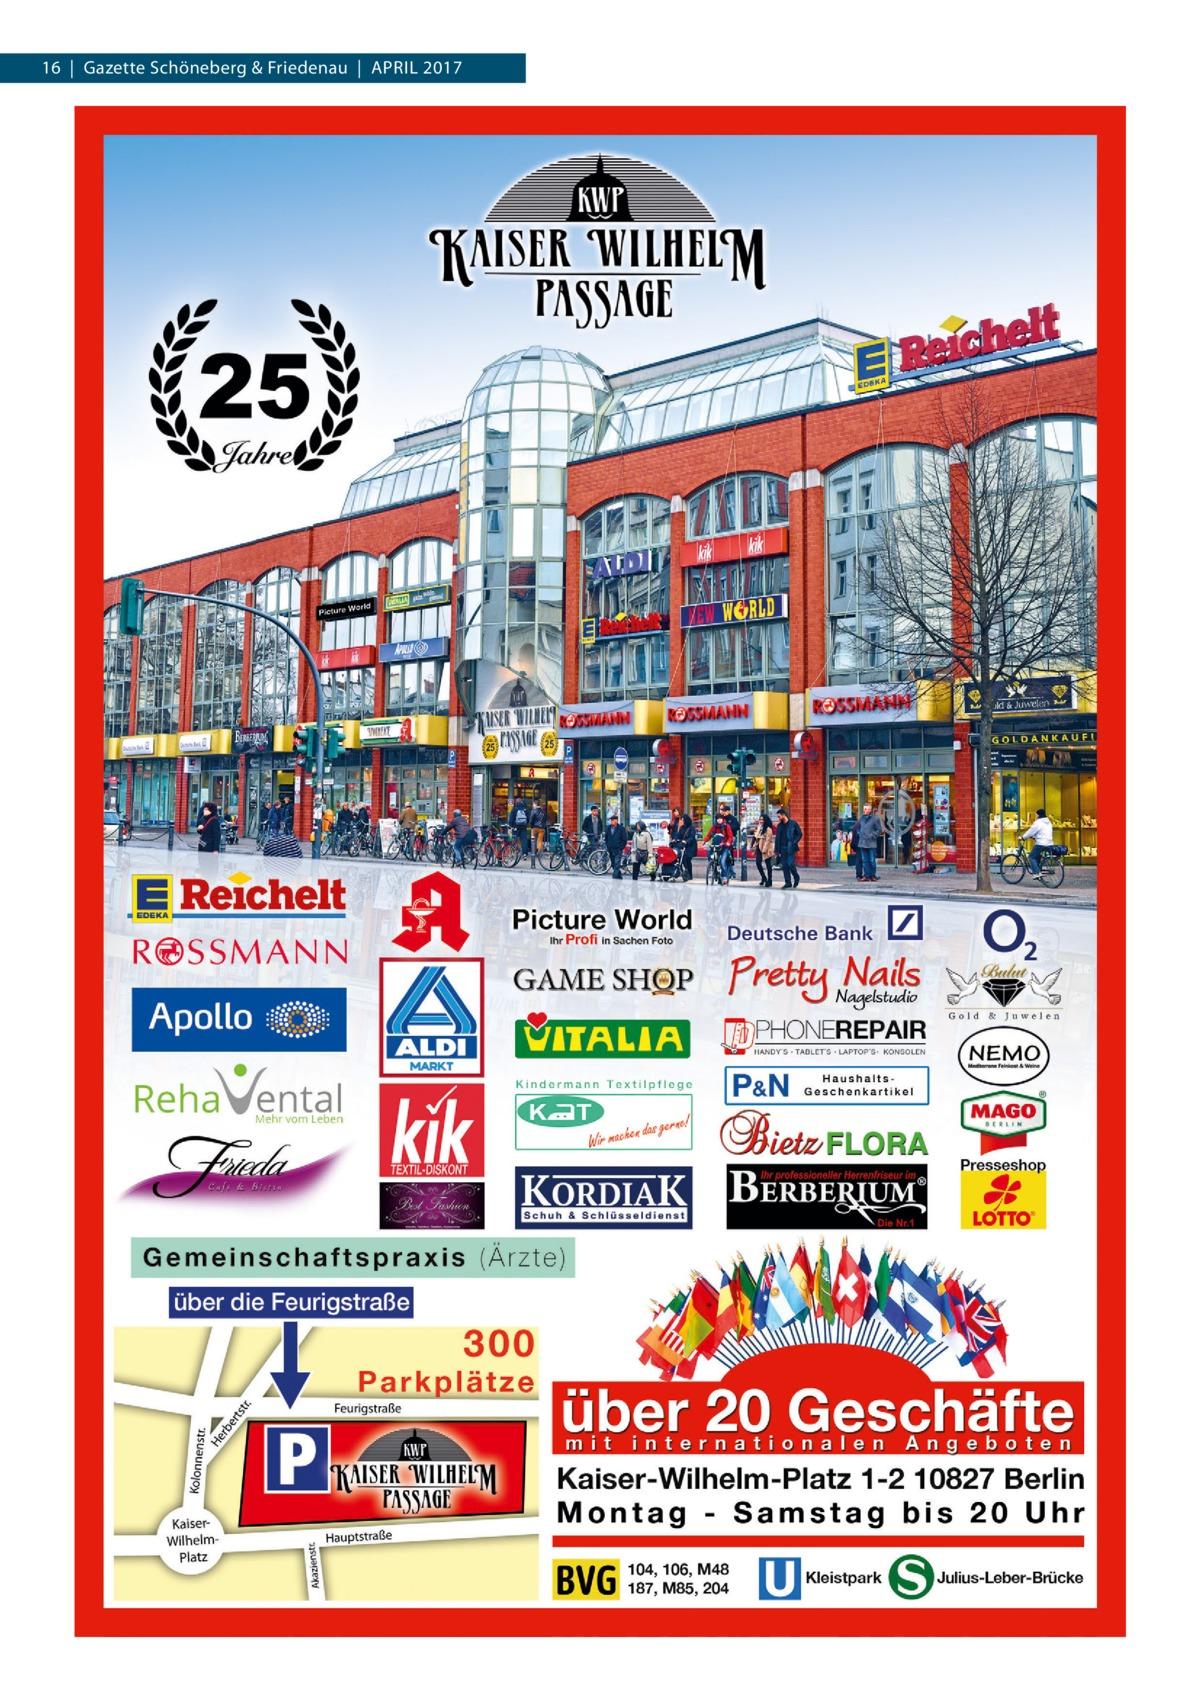 16|Gazette Schöneberg & Friedenau|April 2017